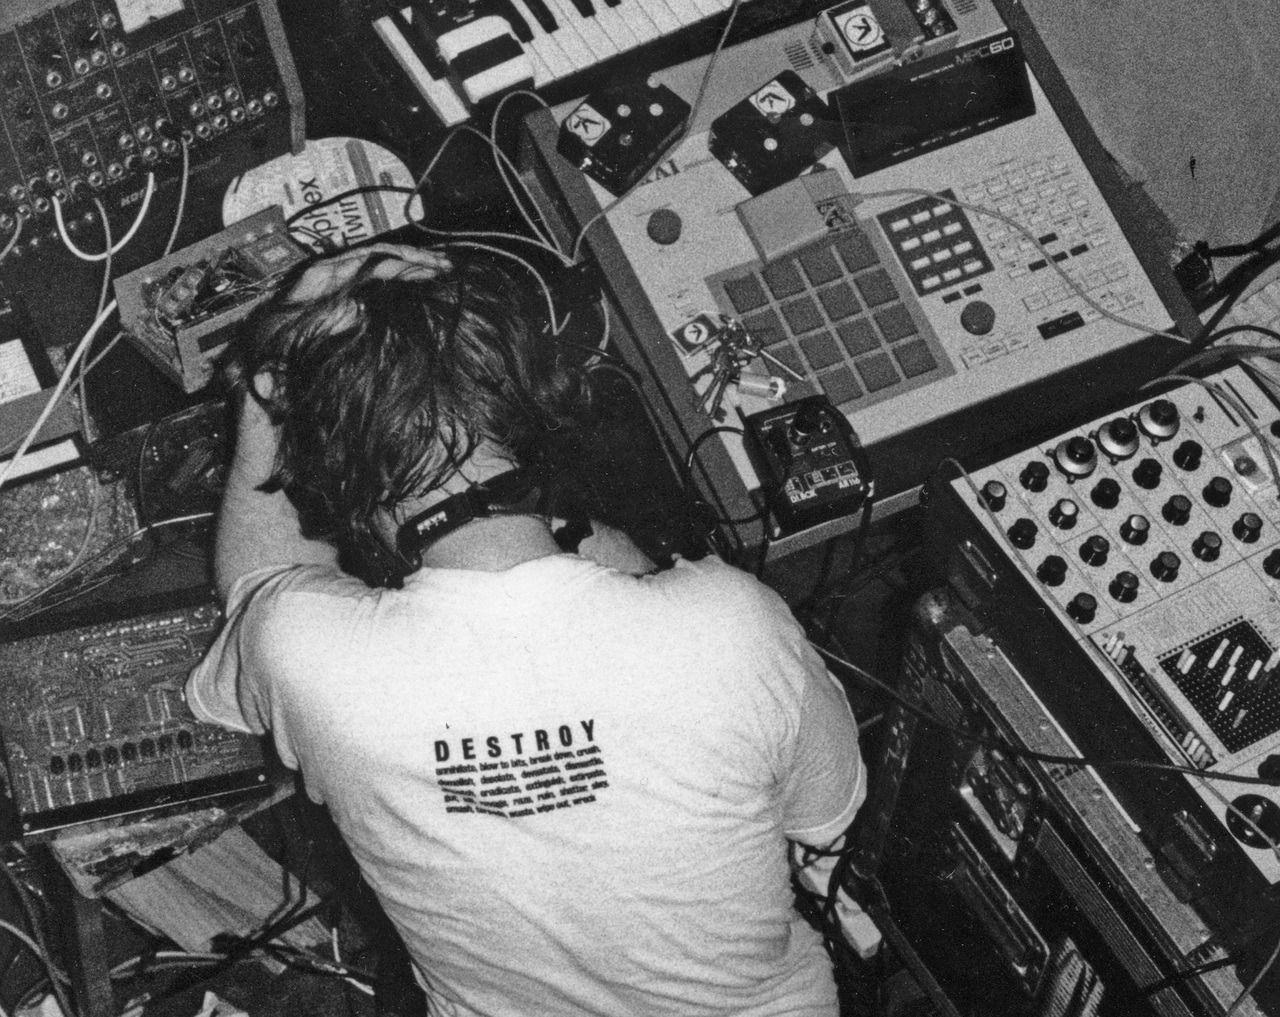 252454 Aphex Twin Electronic Music Modern Music